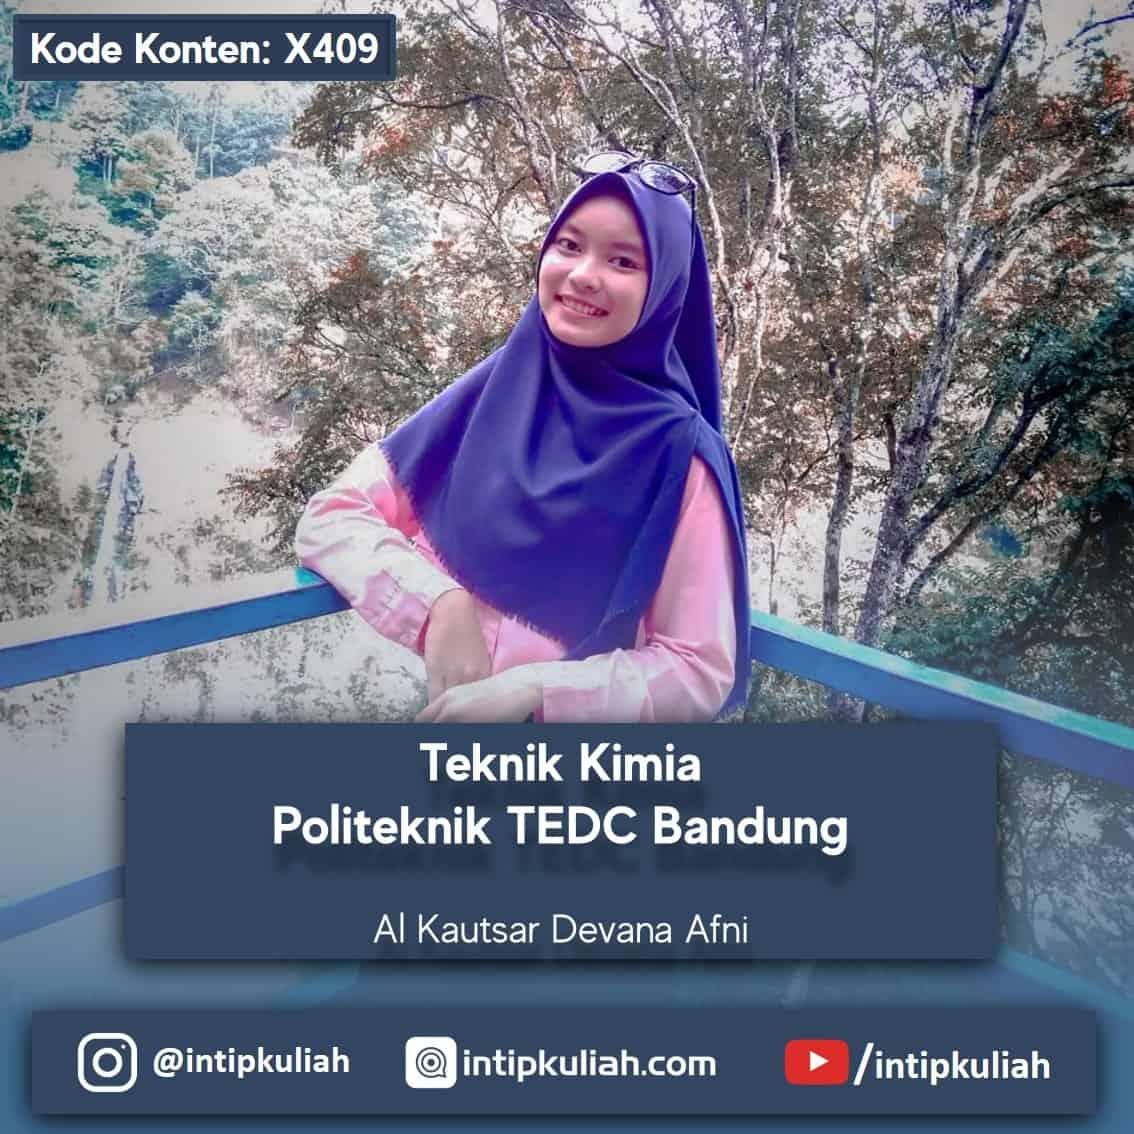 Teknik Kimia Politeknik TEDC Bandung (Al Kautsar)